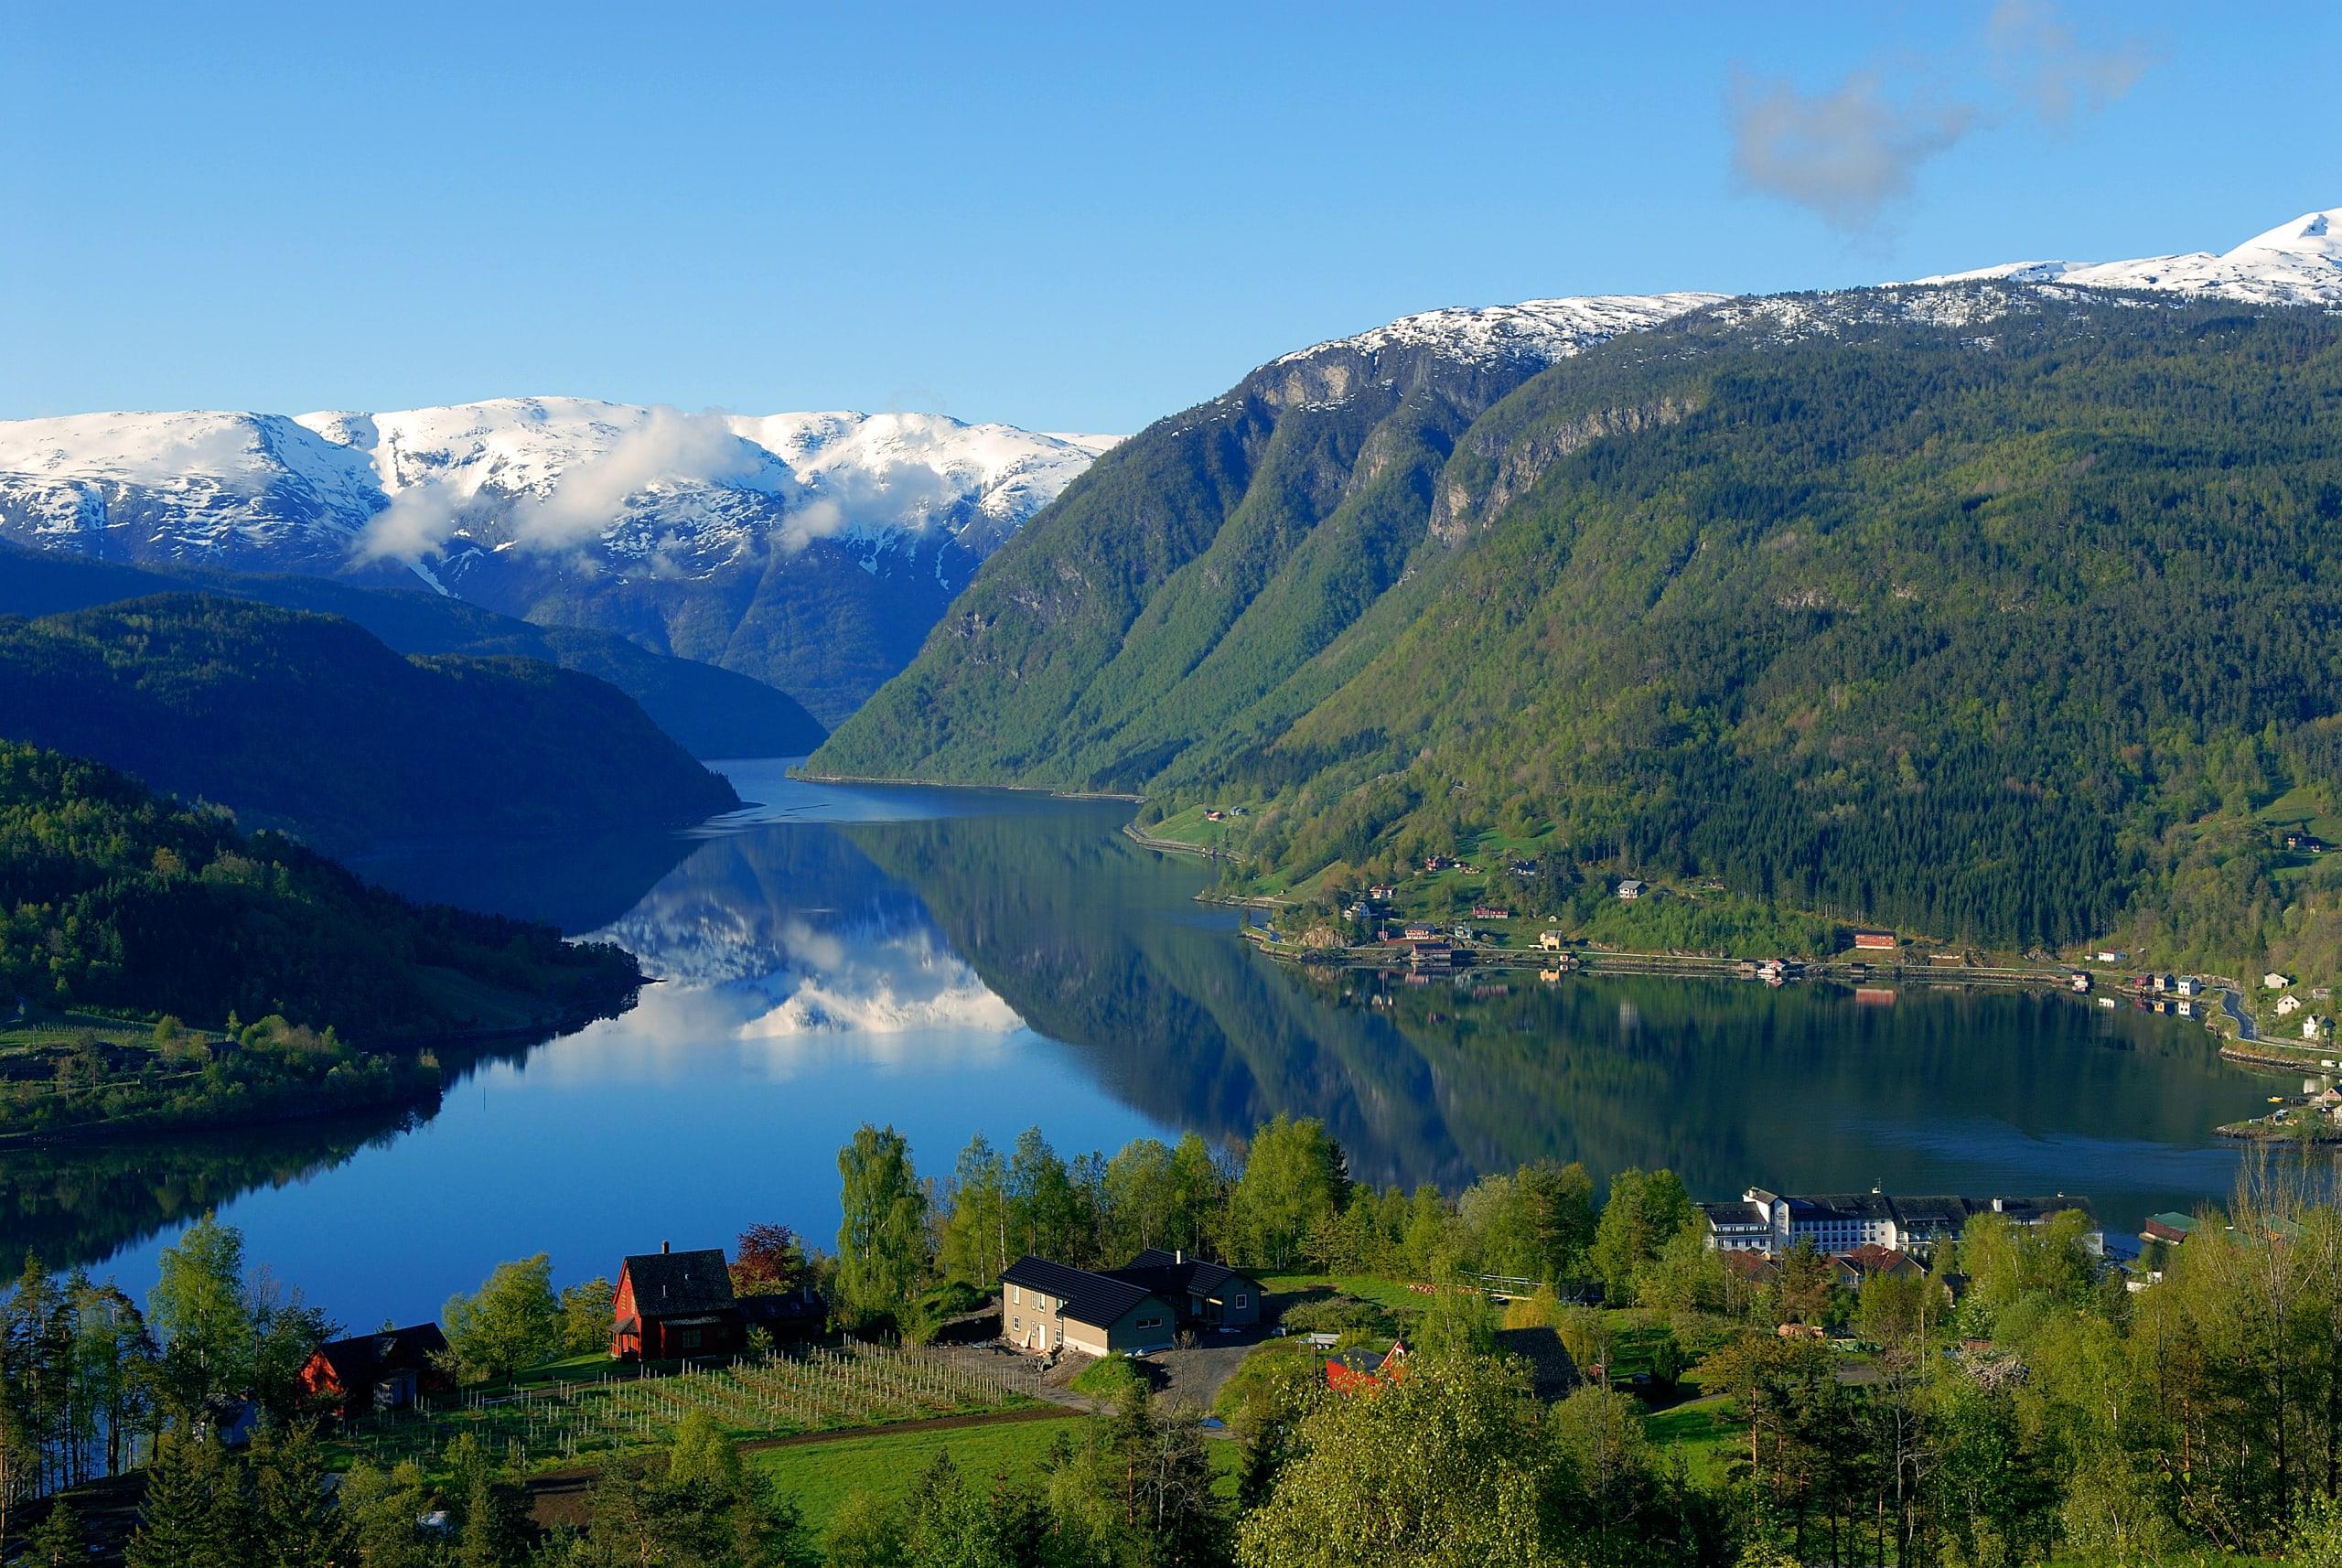 Ulvik fjord village along the Hardangerfjord